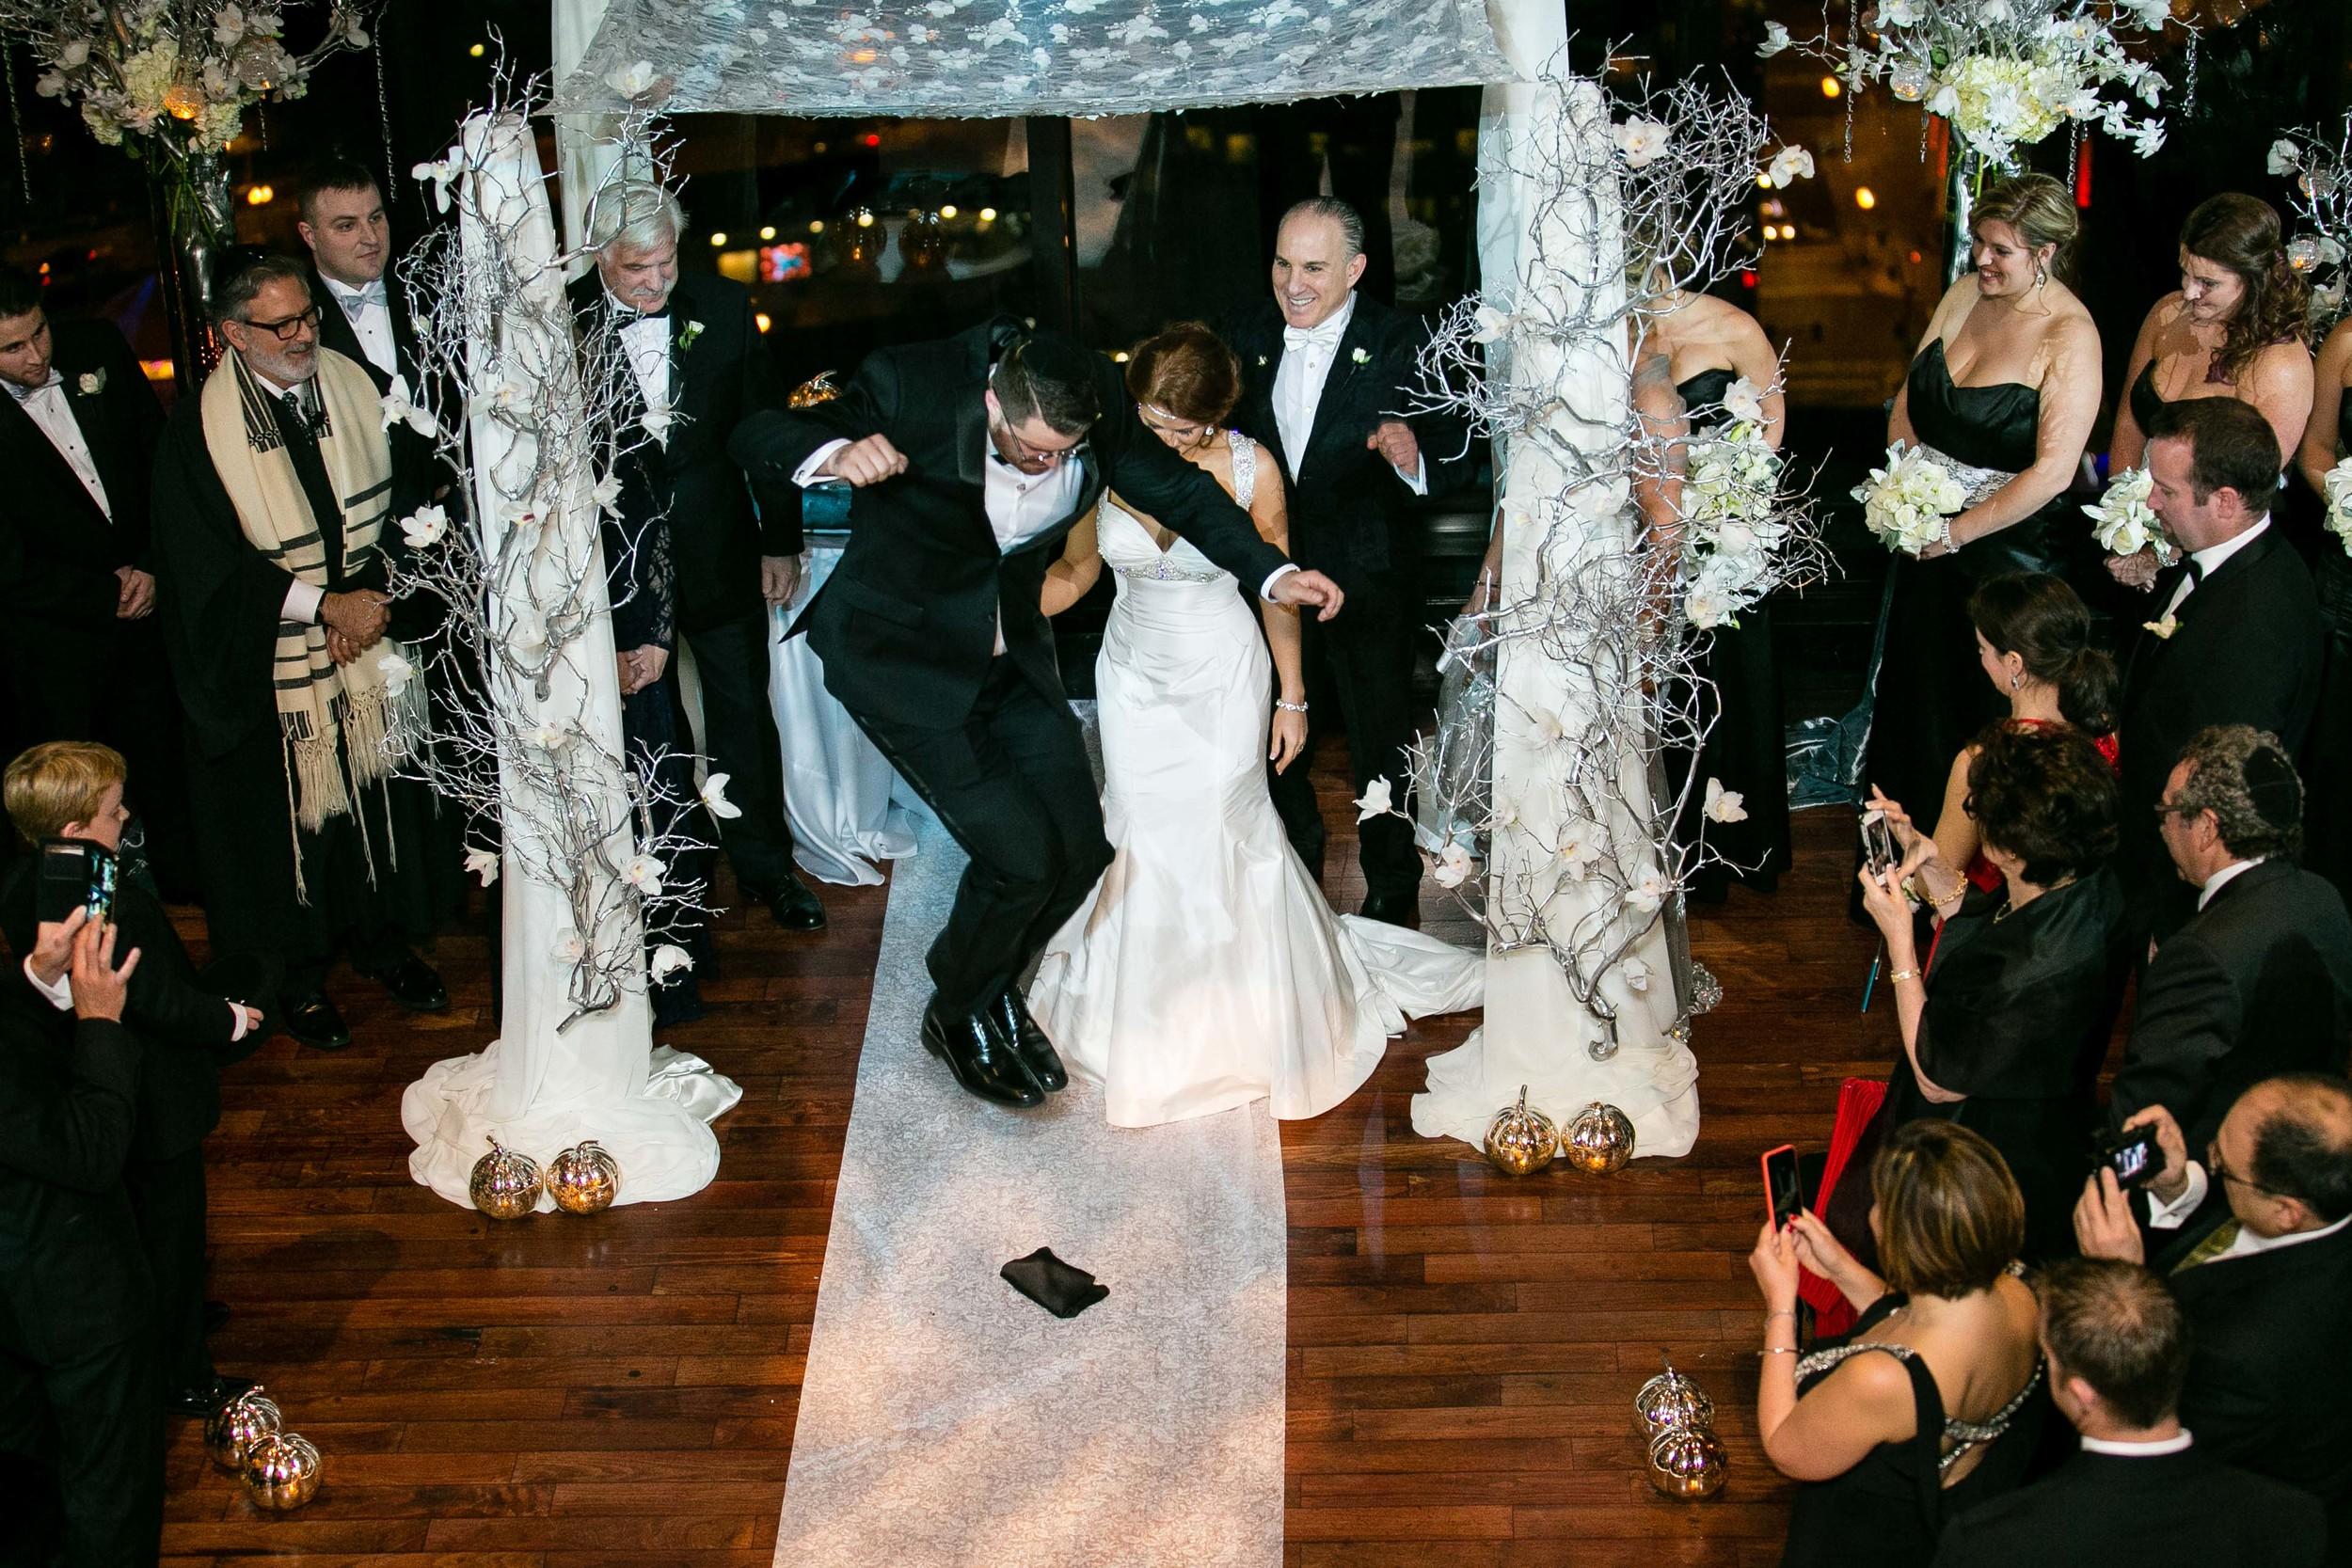 Luxurious-Jewish-Halloween-Wedding-State-Room-Boston-MA-Photojournalistic-Wedding-Photography-Jacek-Dolata-15.jpg